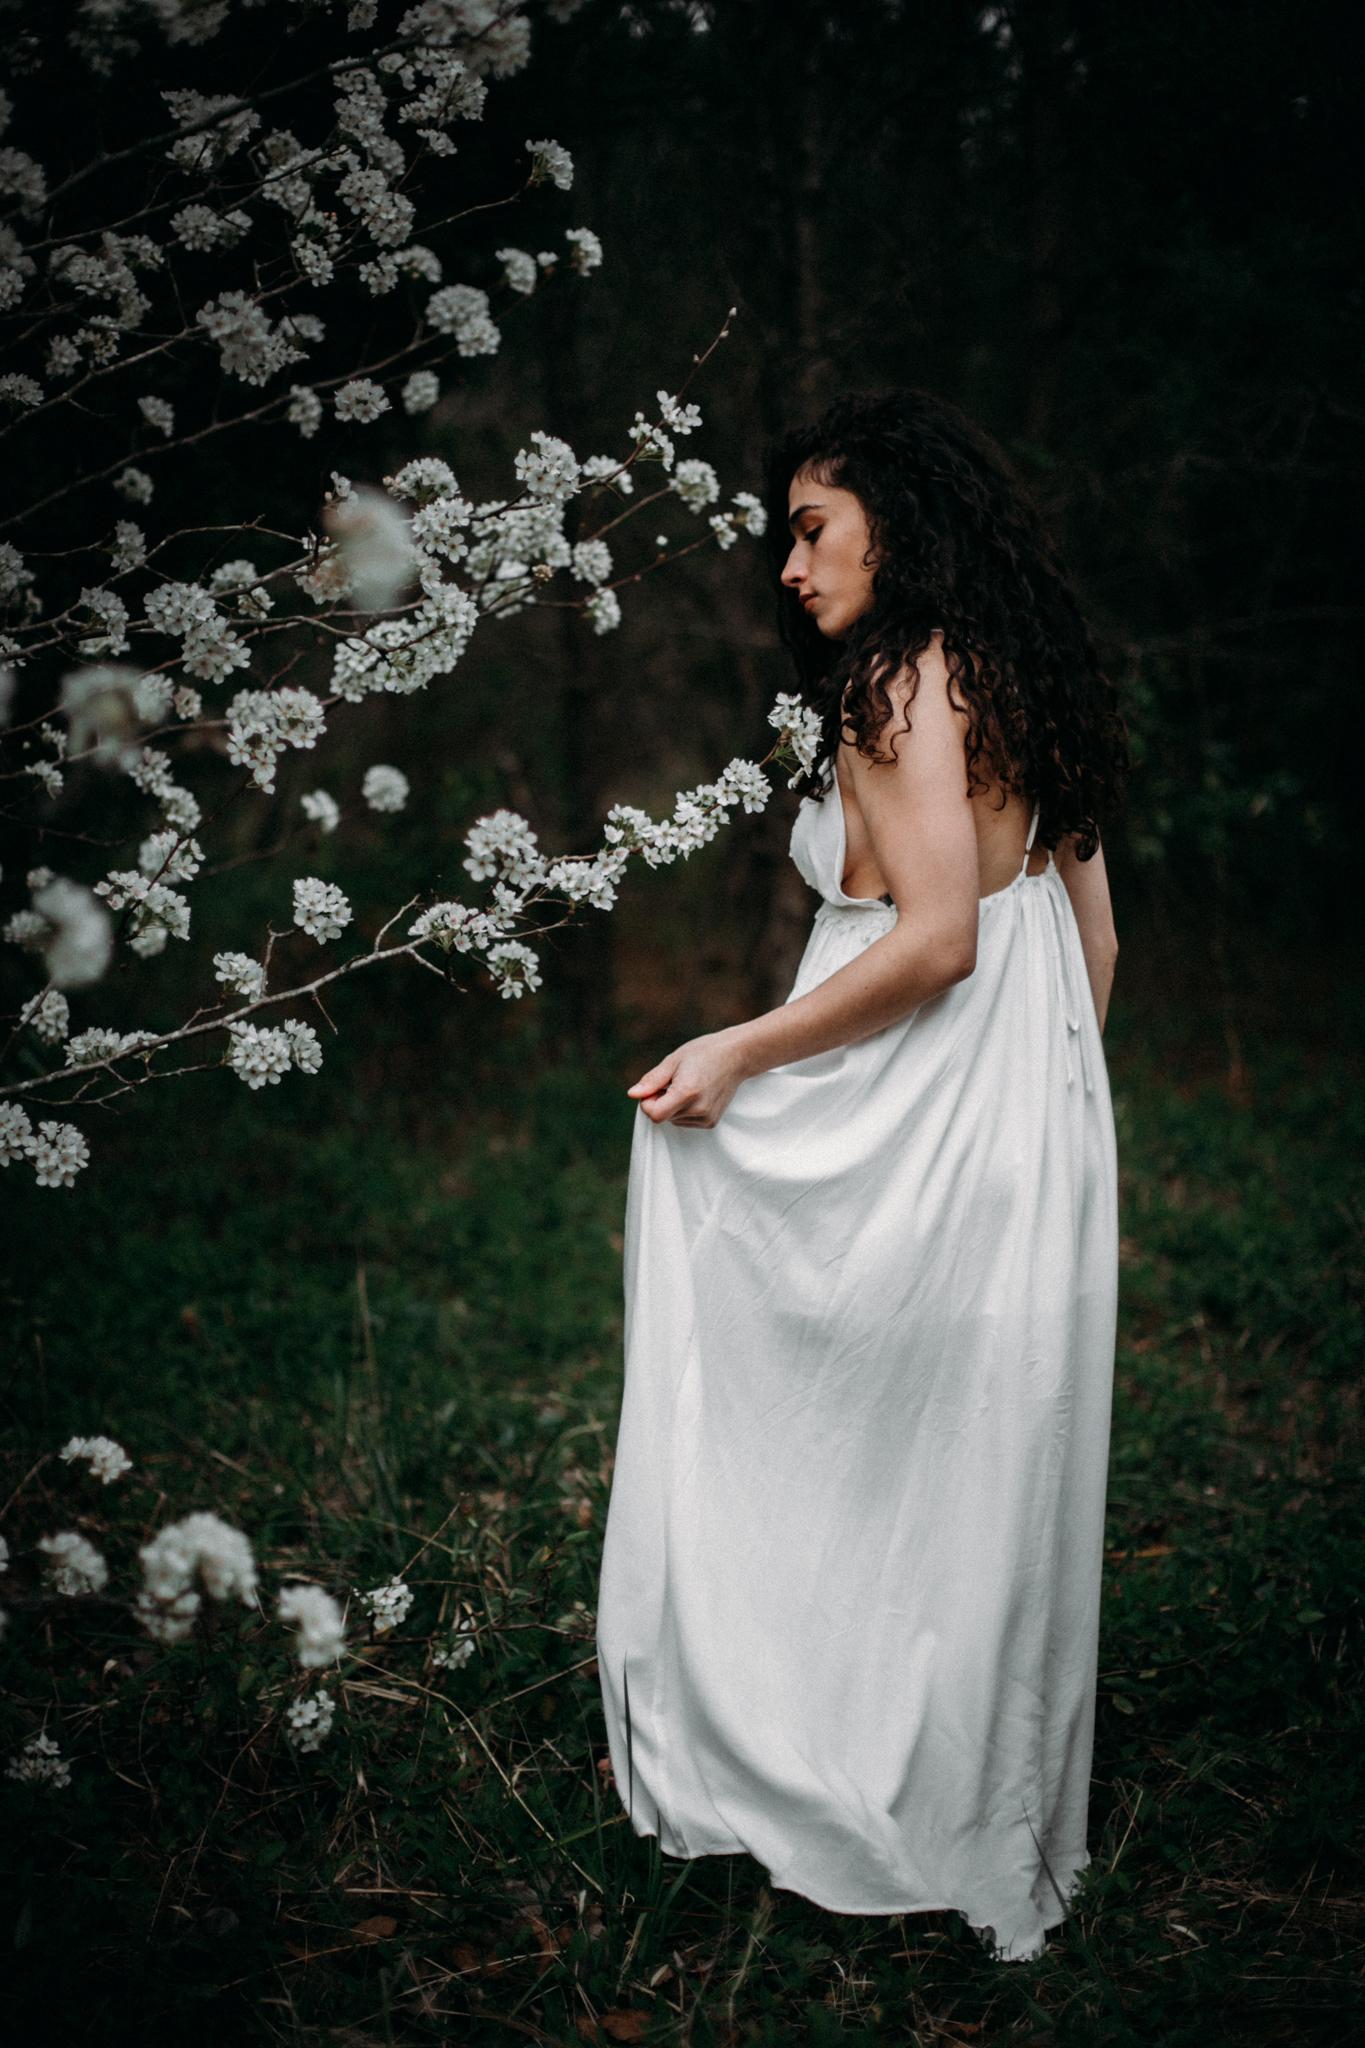 Jessica.VirginiaBeach.Virginia.Boudoir.emotivestorytelling-36.JPG